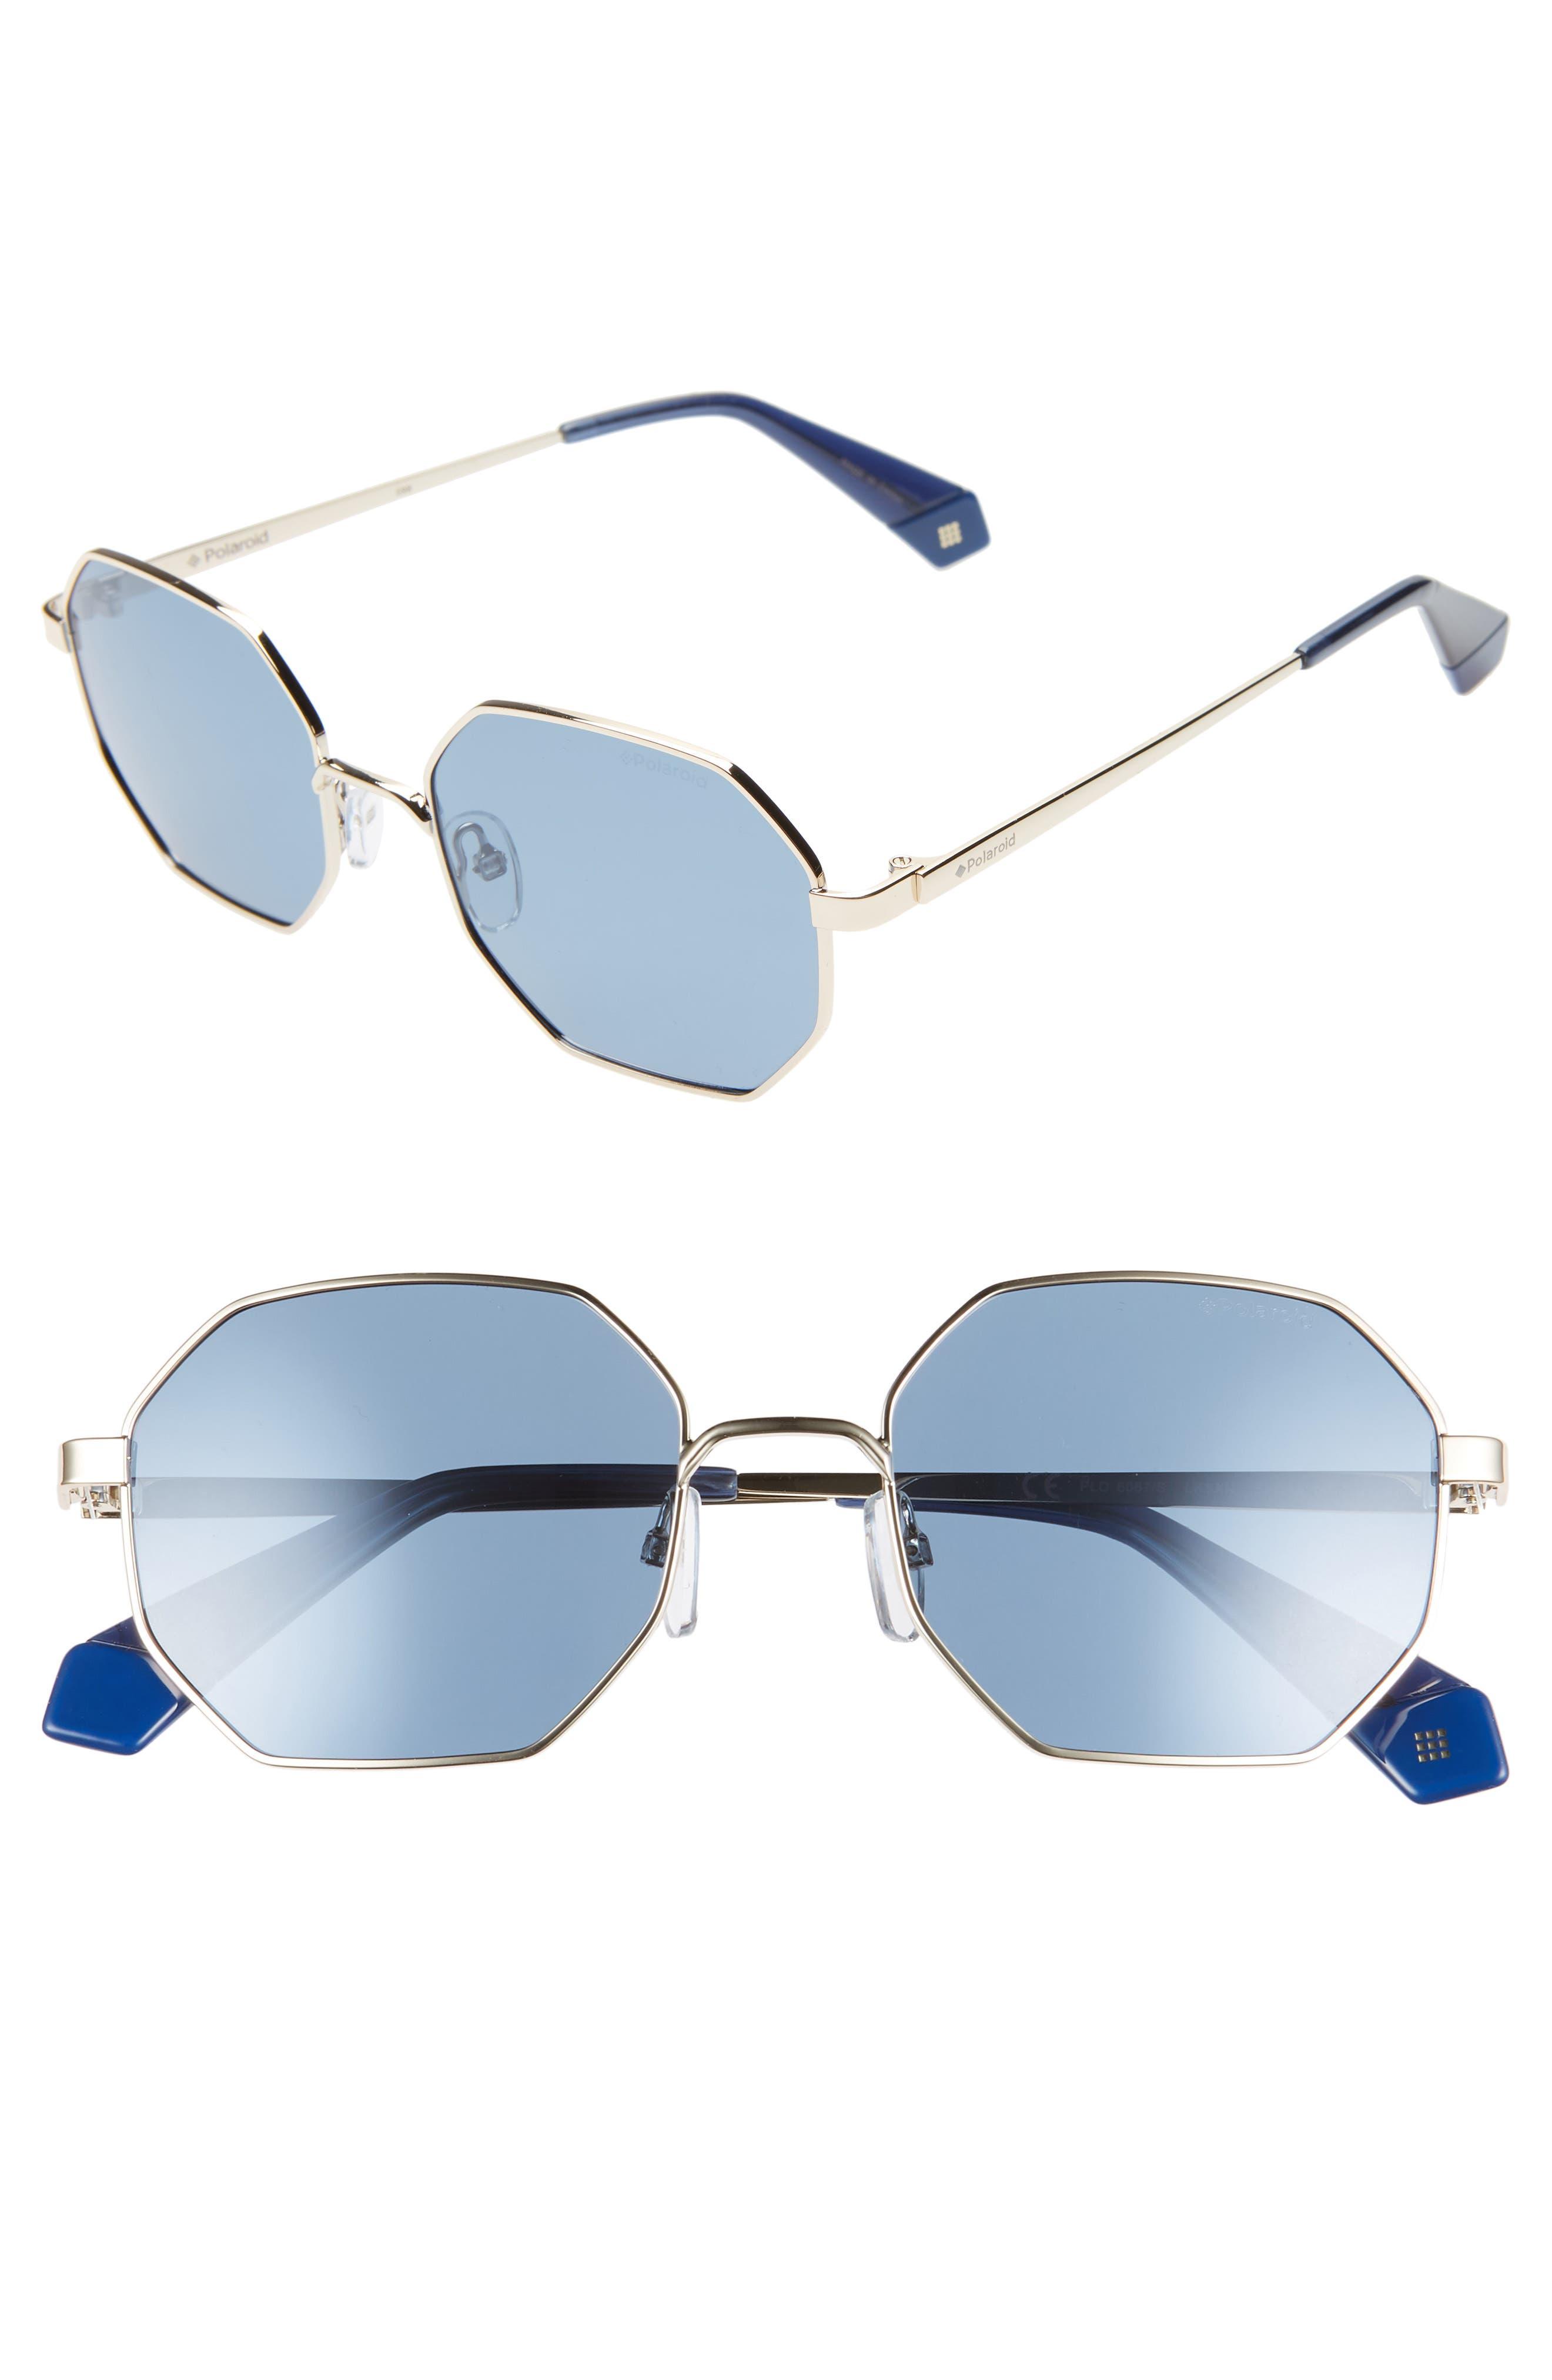 Polaroid 5m Geometric Polarized Sunglasses - Gold/ Blue